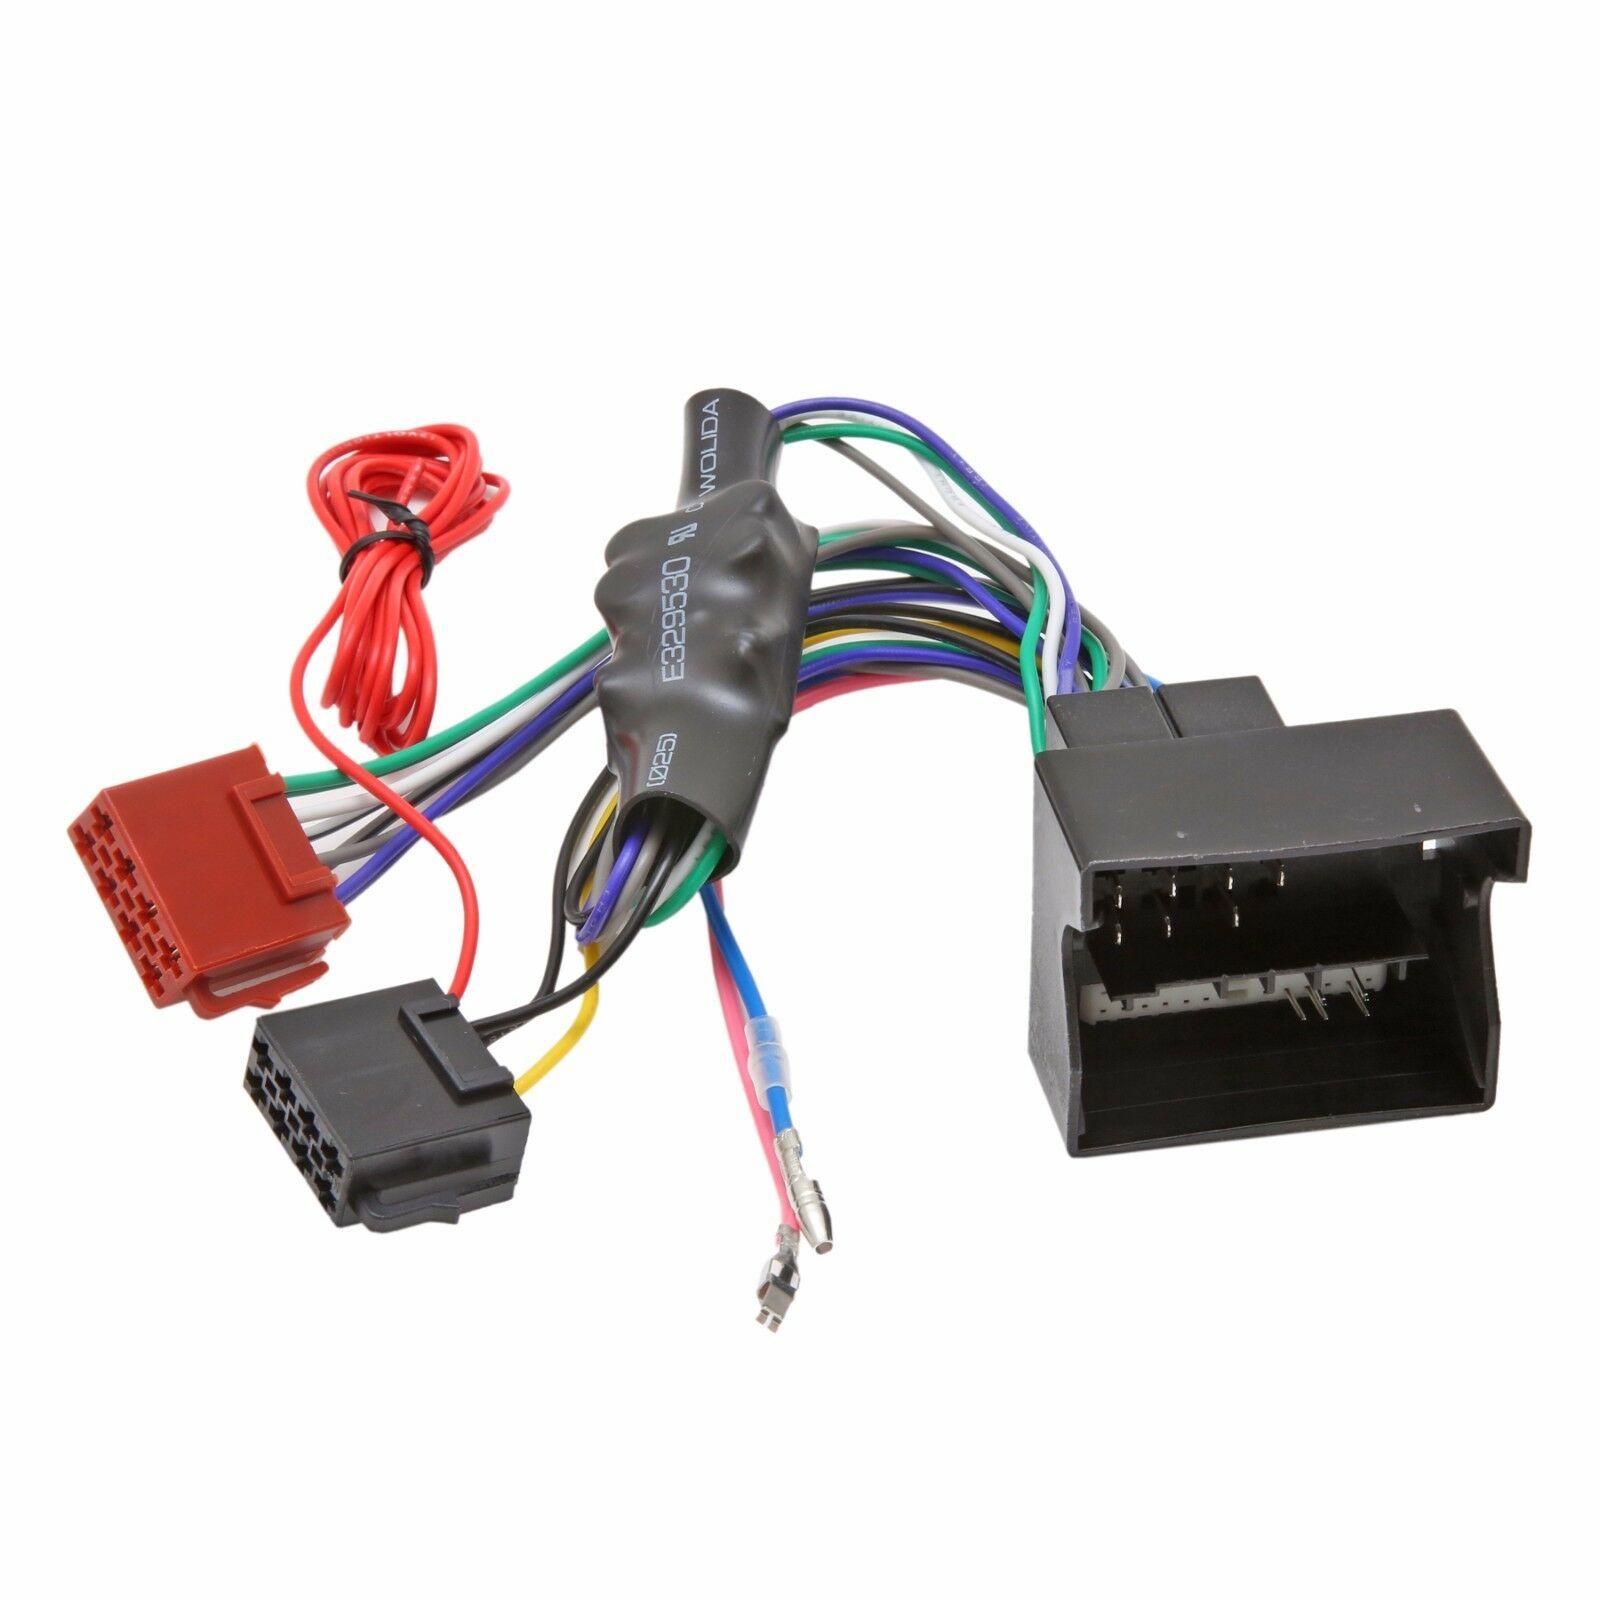 EL_0843] Audi A4 Radio Wiring Harness Diagram Free DiagramEtic Ndine Ungo Venet Jebrp Faun Attr Benkeme Mohammedshrine Librar Wiring  101